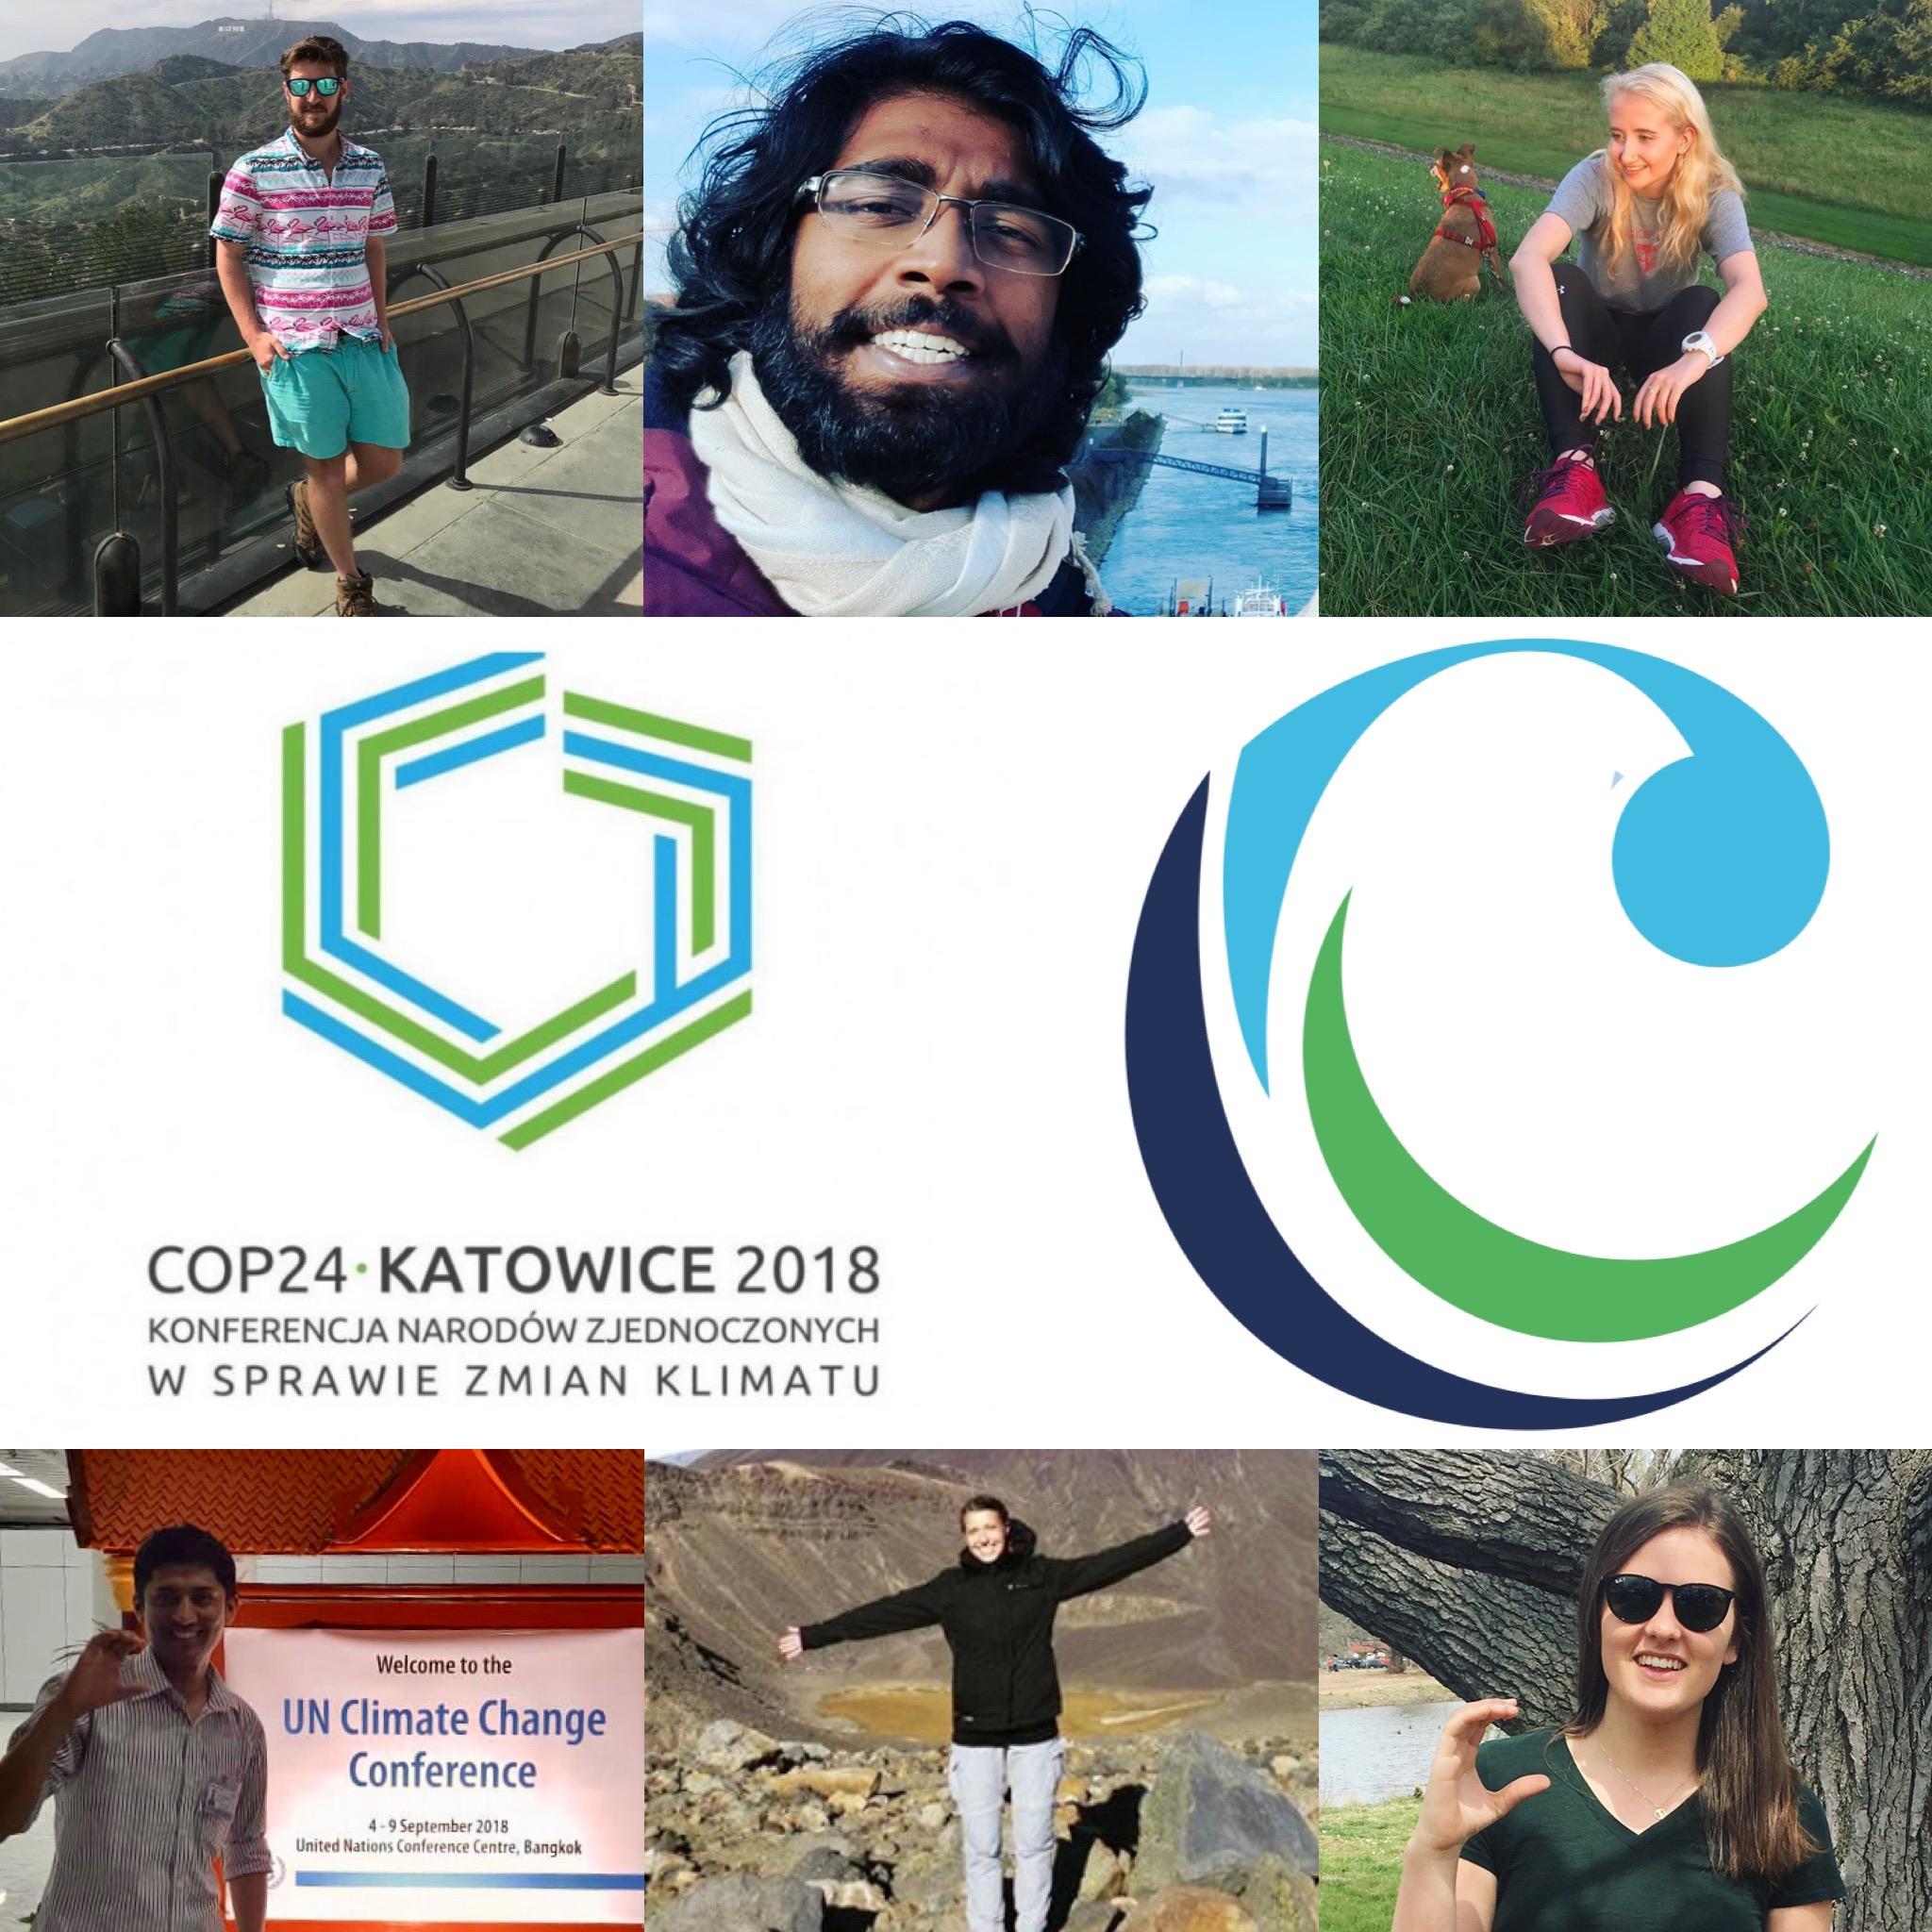 Care About Climate COP24 Delegation, pictured, left to right:   Top : Nick Jones* (USA); Amalen Sathanthar (Malaysia); Sydney Welter (USA)  Bottom : Pradeep Bhattarai (Nepal); Nora Wissner (Germany); Sabina Maniak* (USA)   *Delegation Leadership